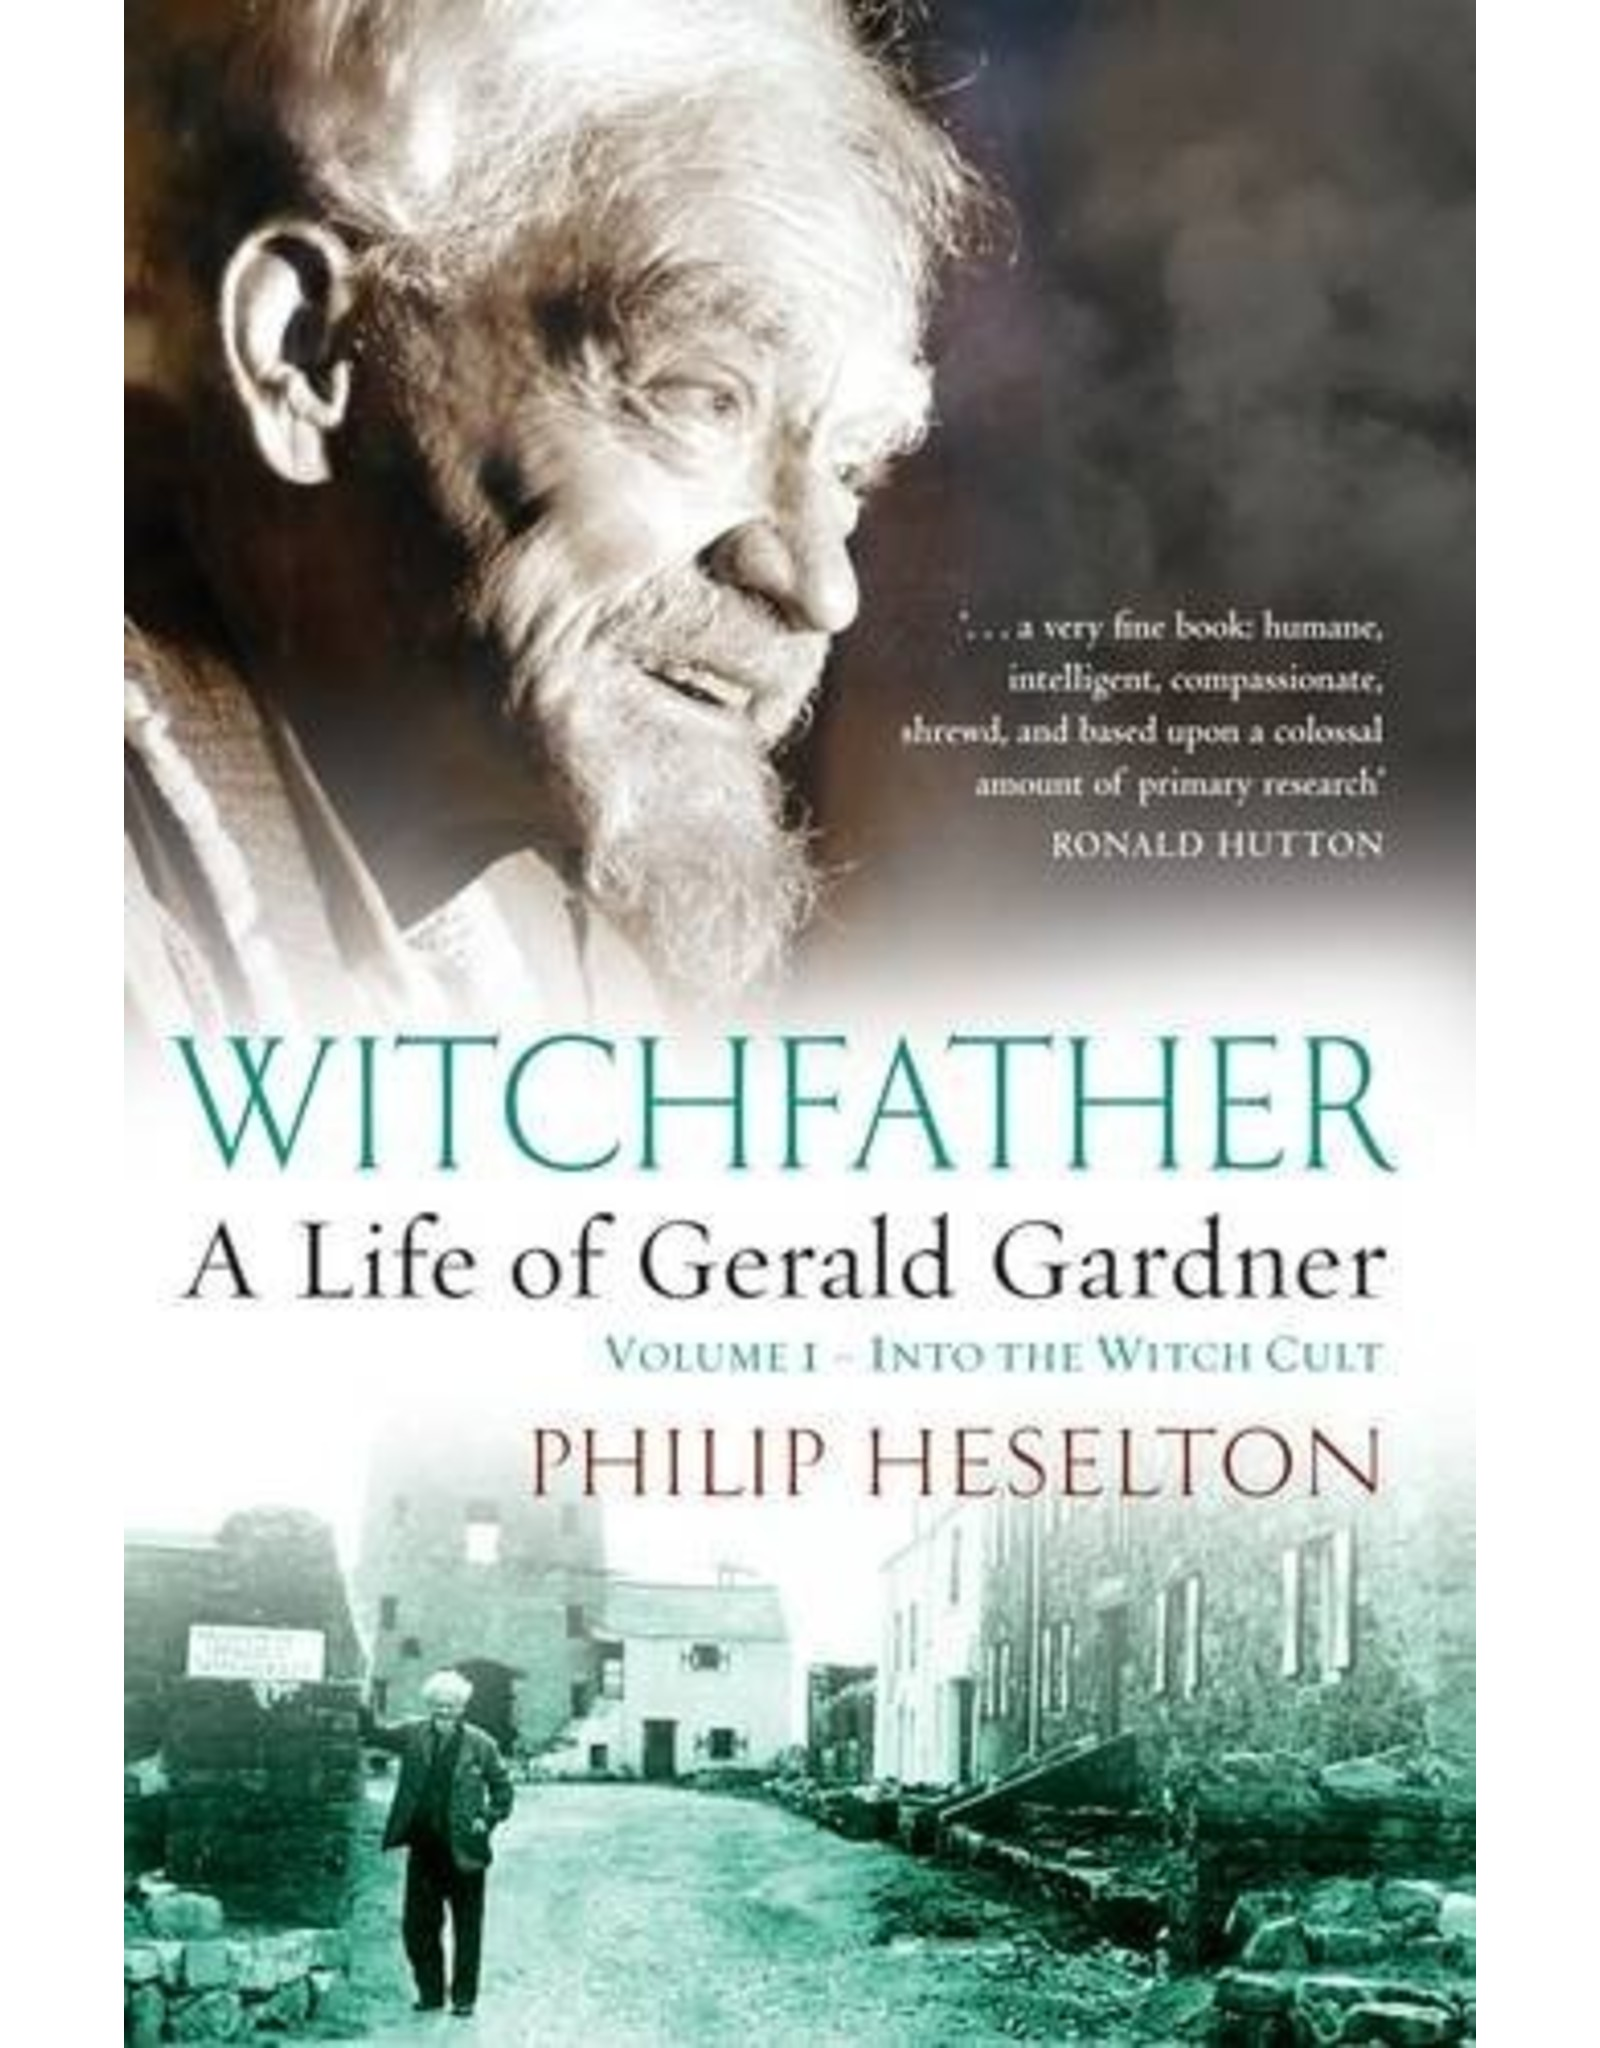 Witchfarther: A Life of Gerald Gardner Volume I